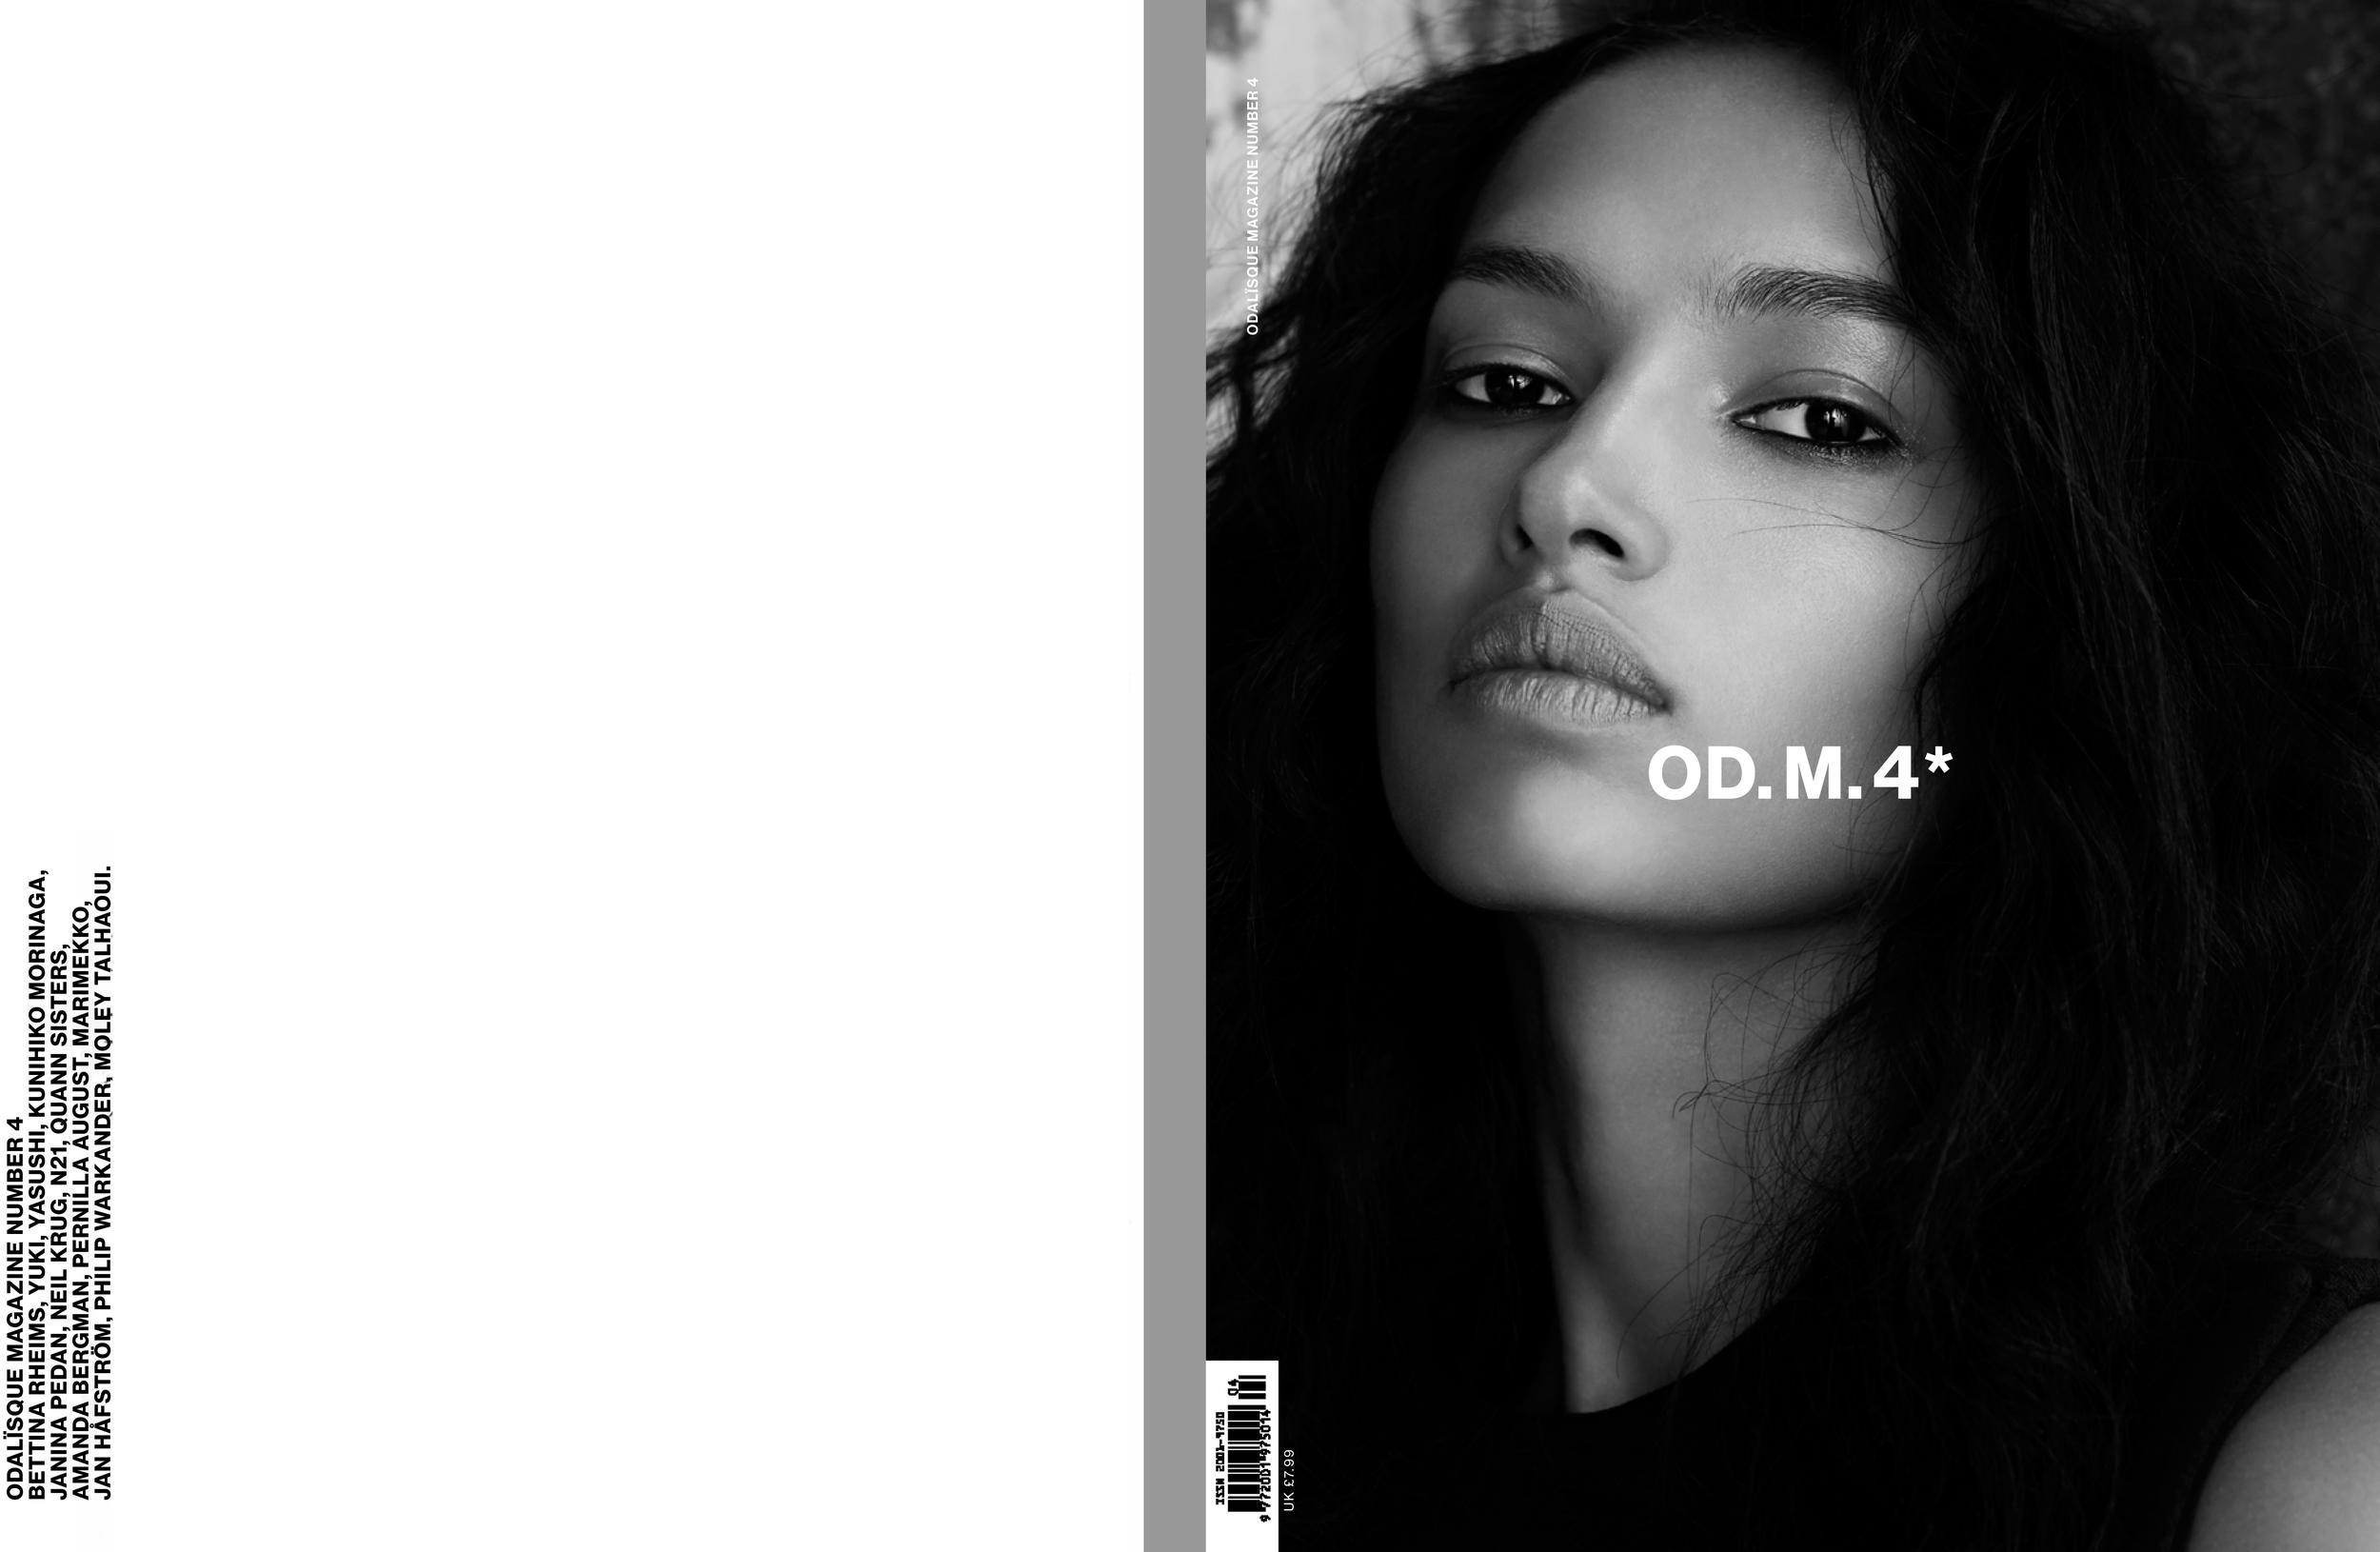 ODM4_COVER_BW-STIGLE.jpg